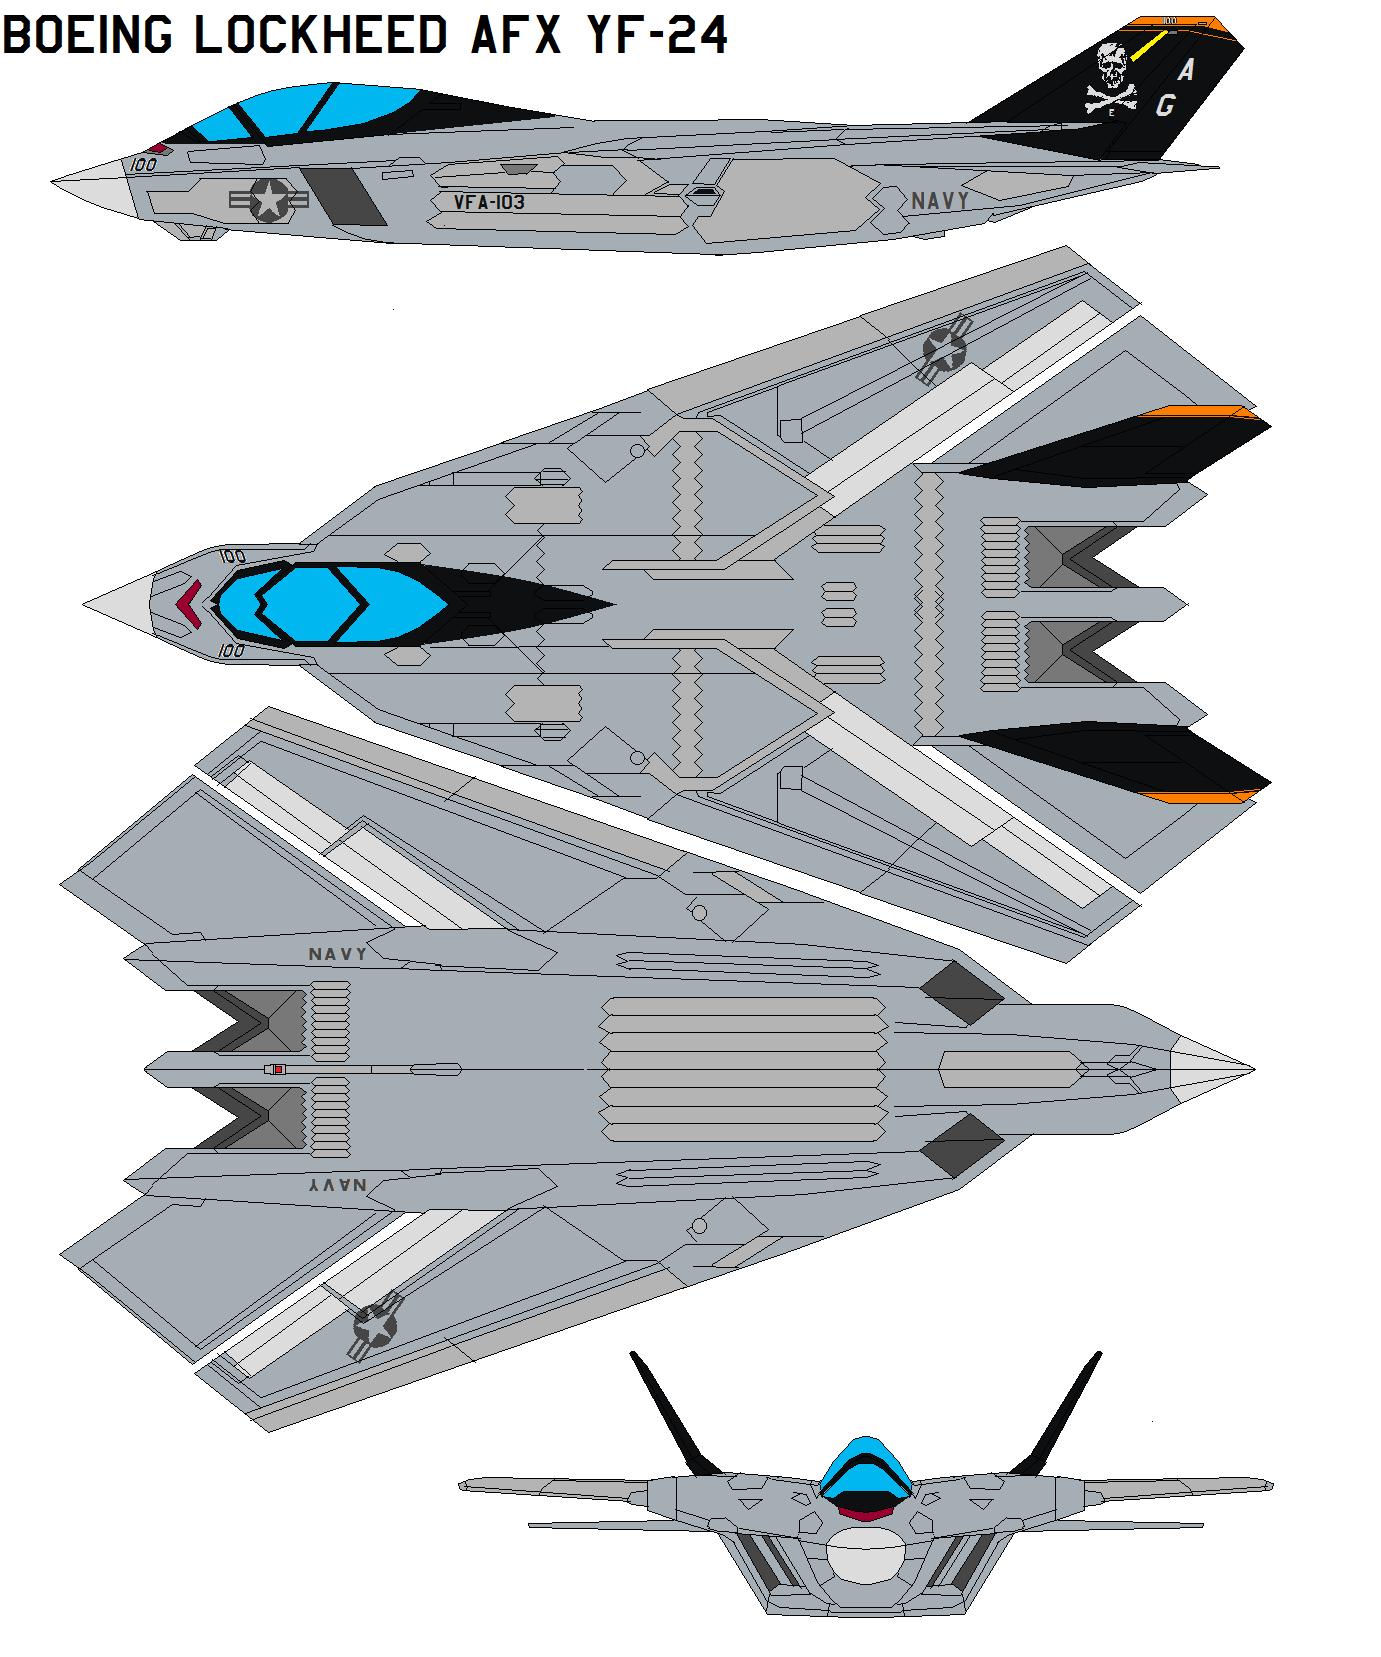 Boeing Lockheed AFX YF-24 by bagera3005